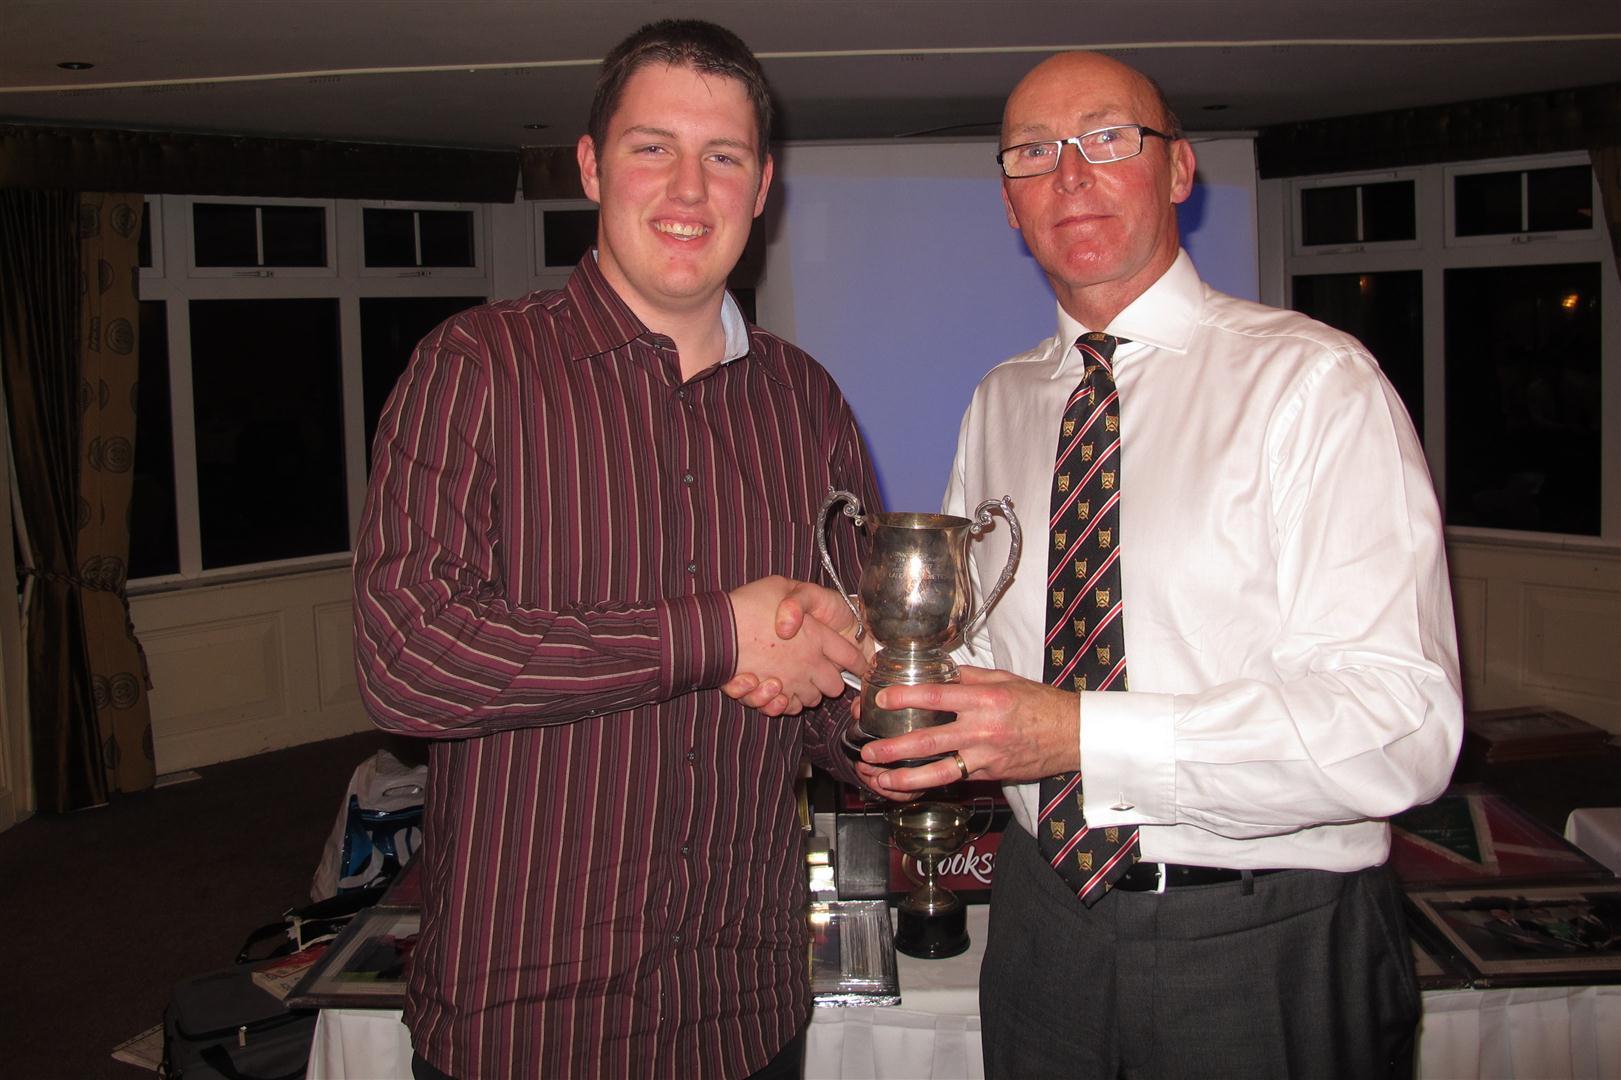 Matthew Leighton club person of the year